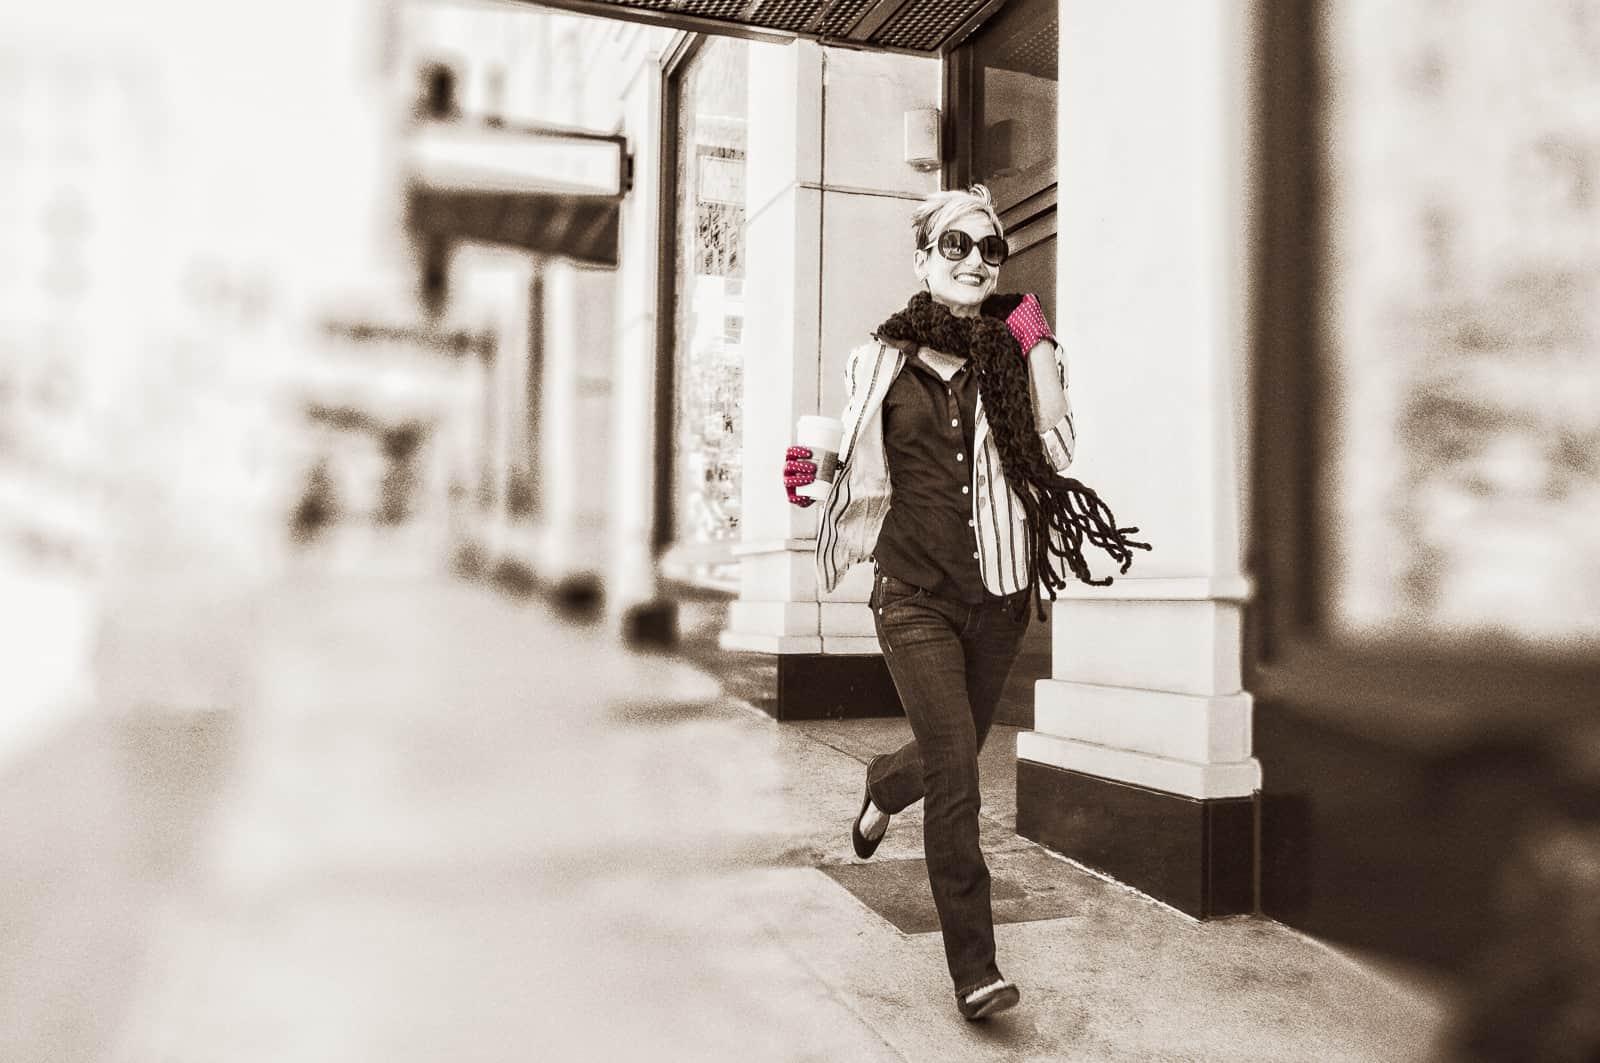 beau-gant-gloves-polka-dot-gloves-red-white-fashion